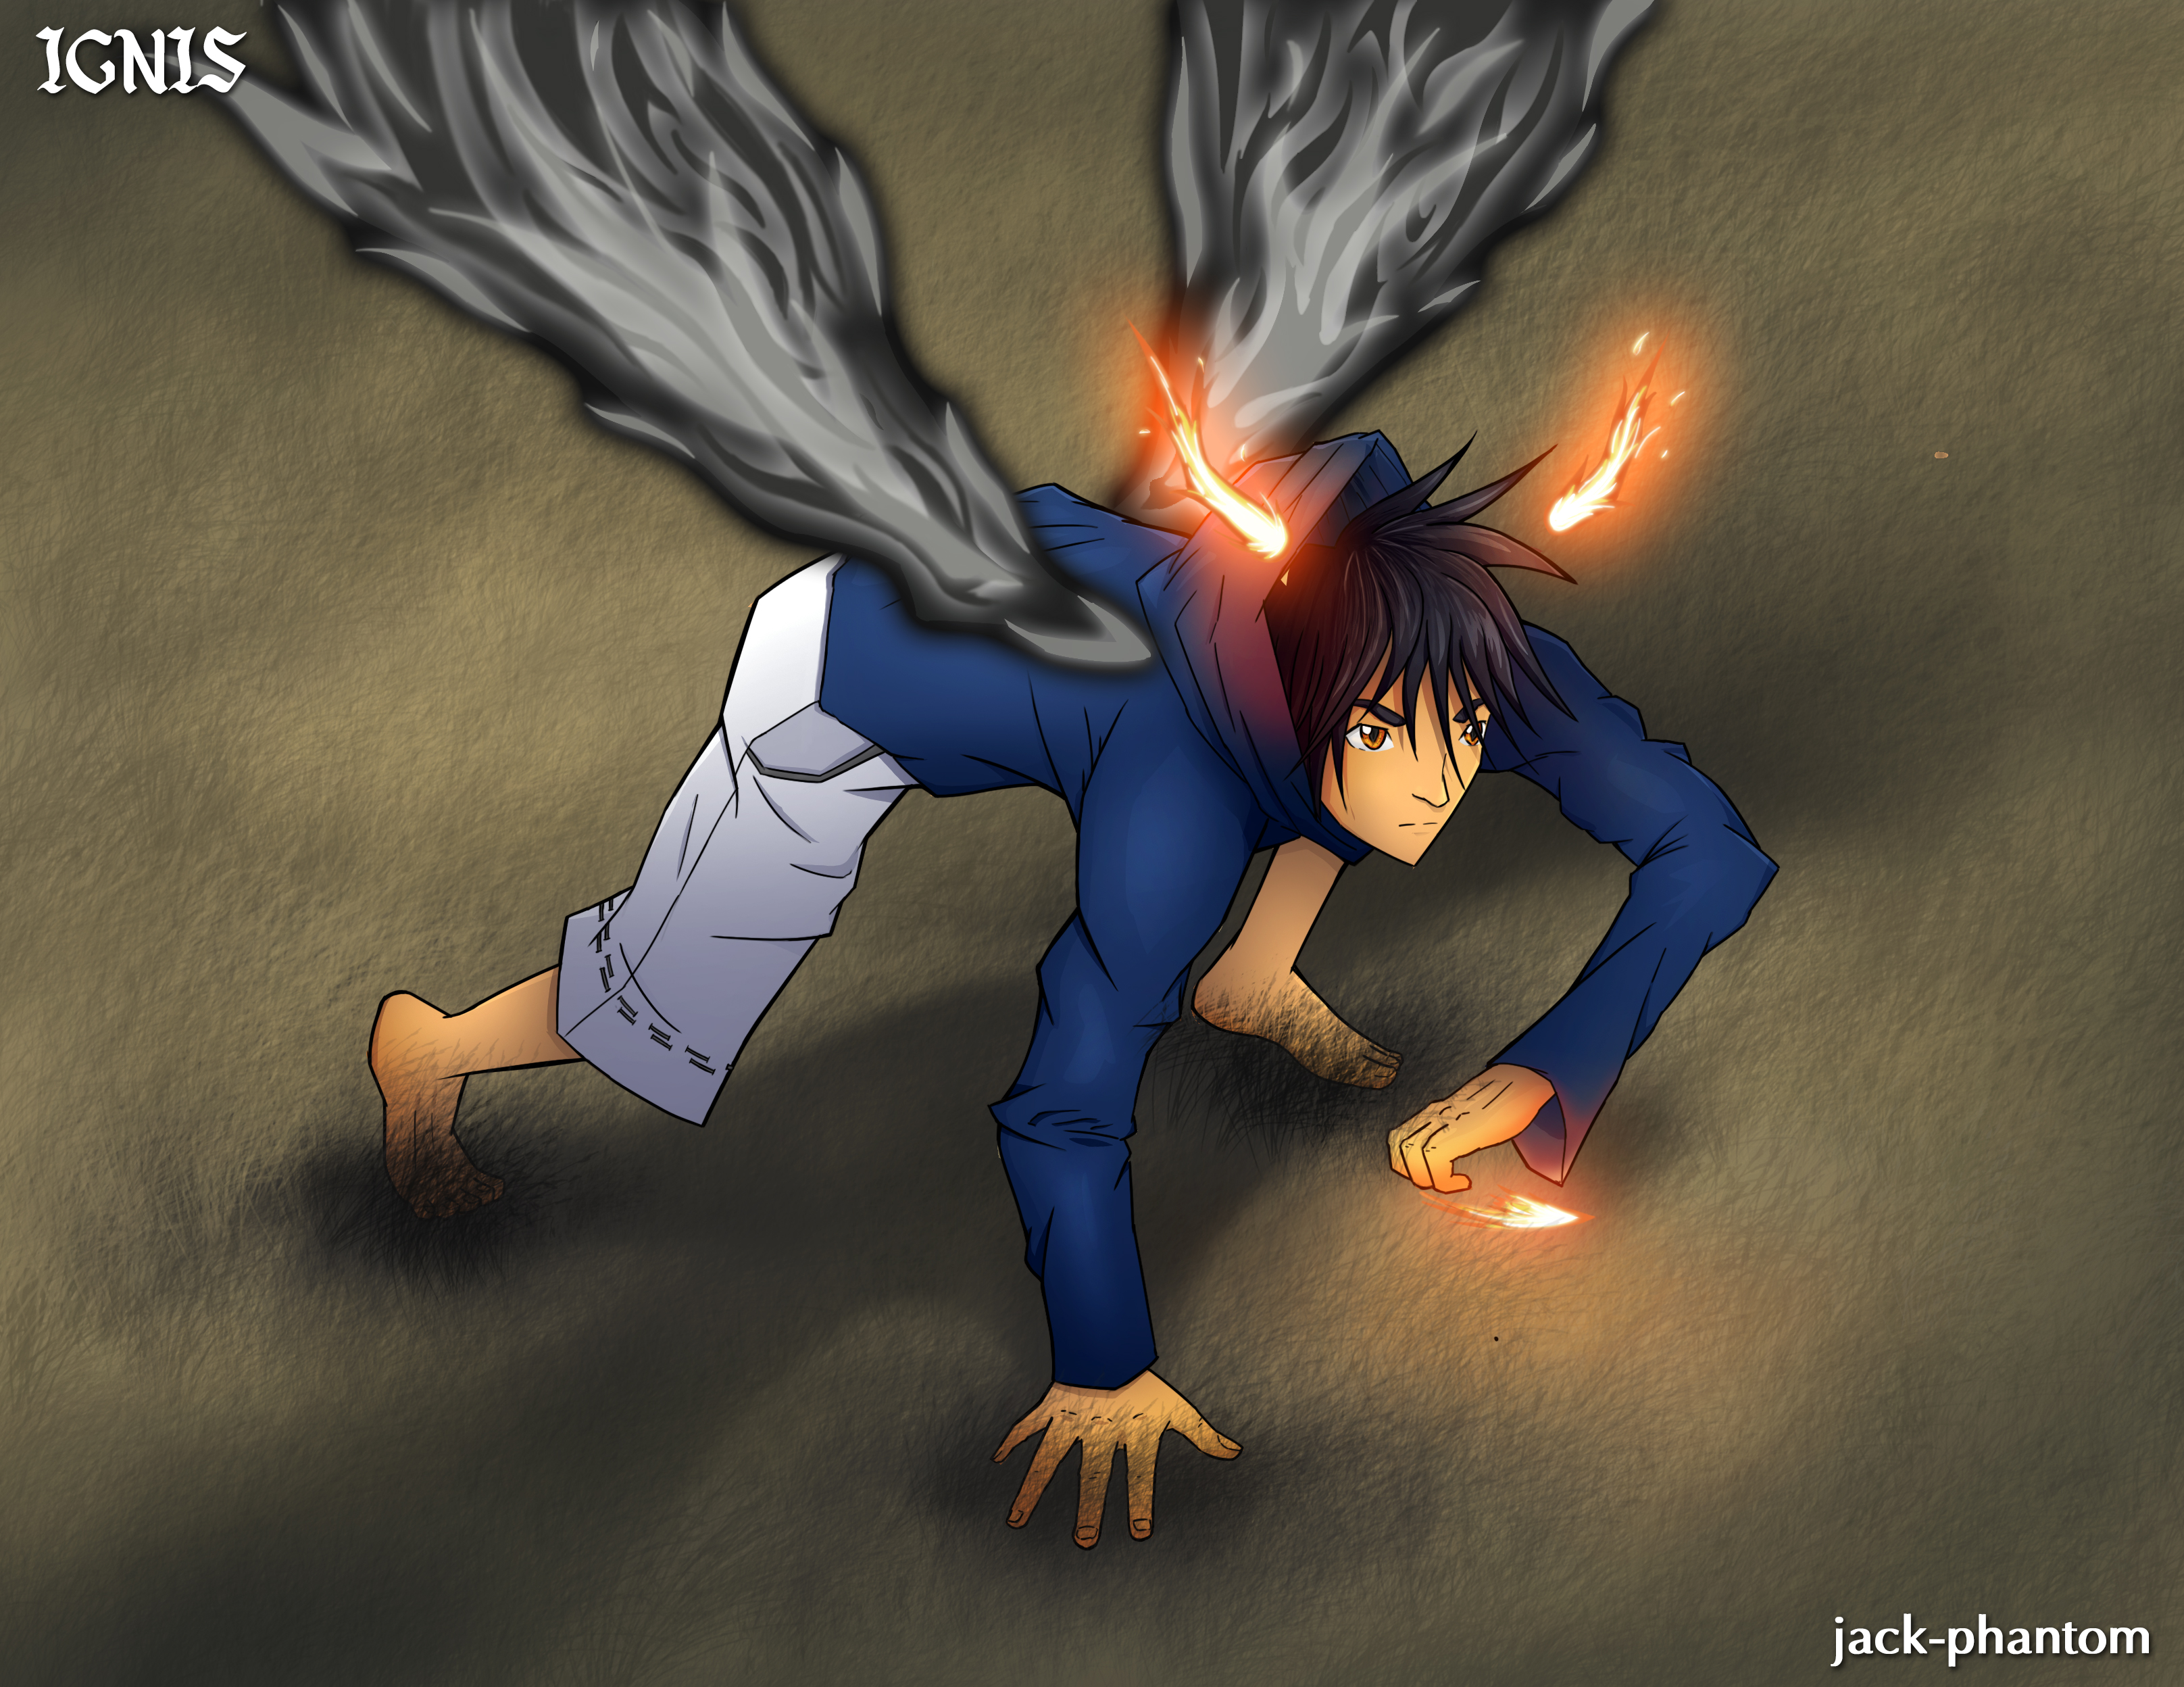 The Blackfire Demon